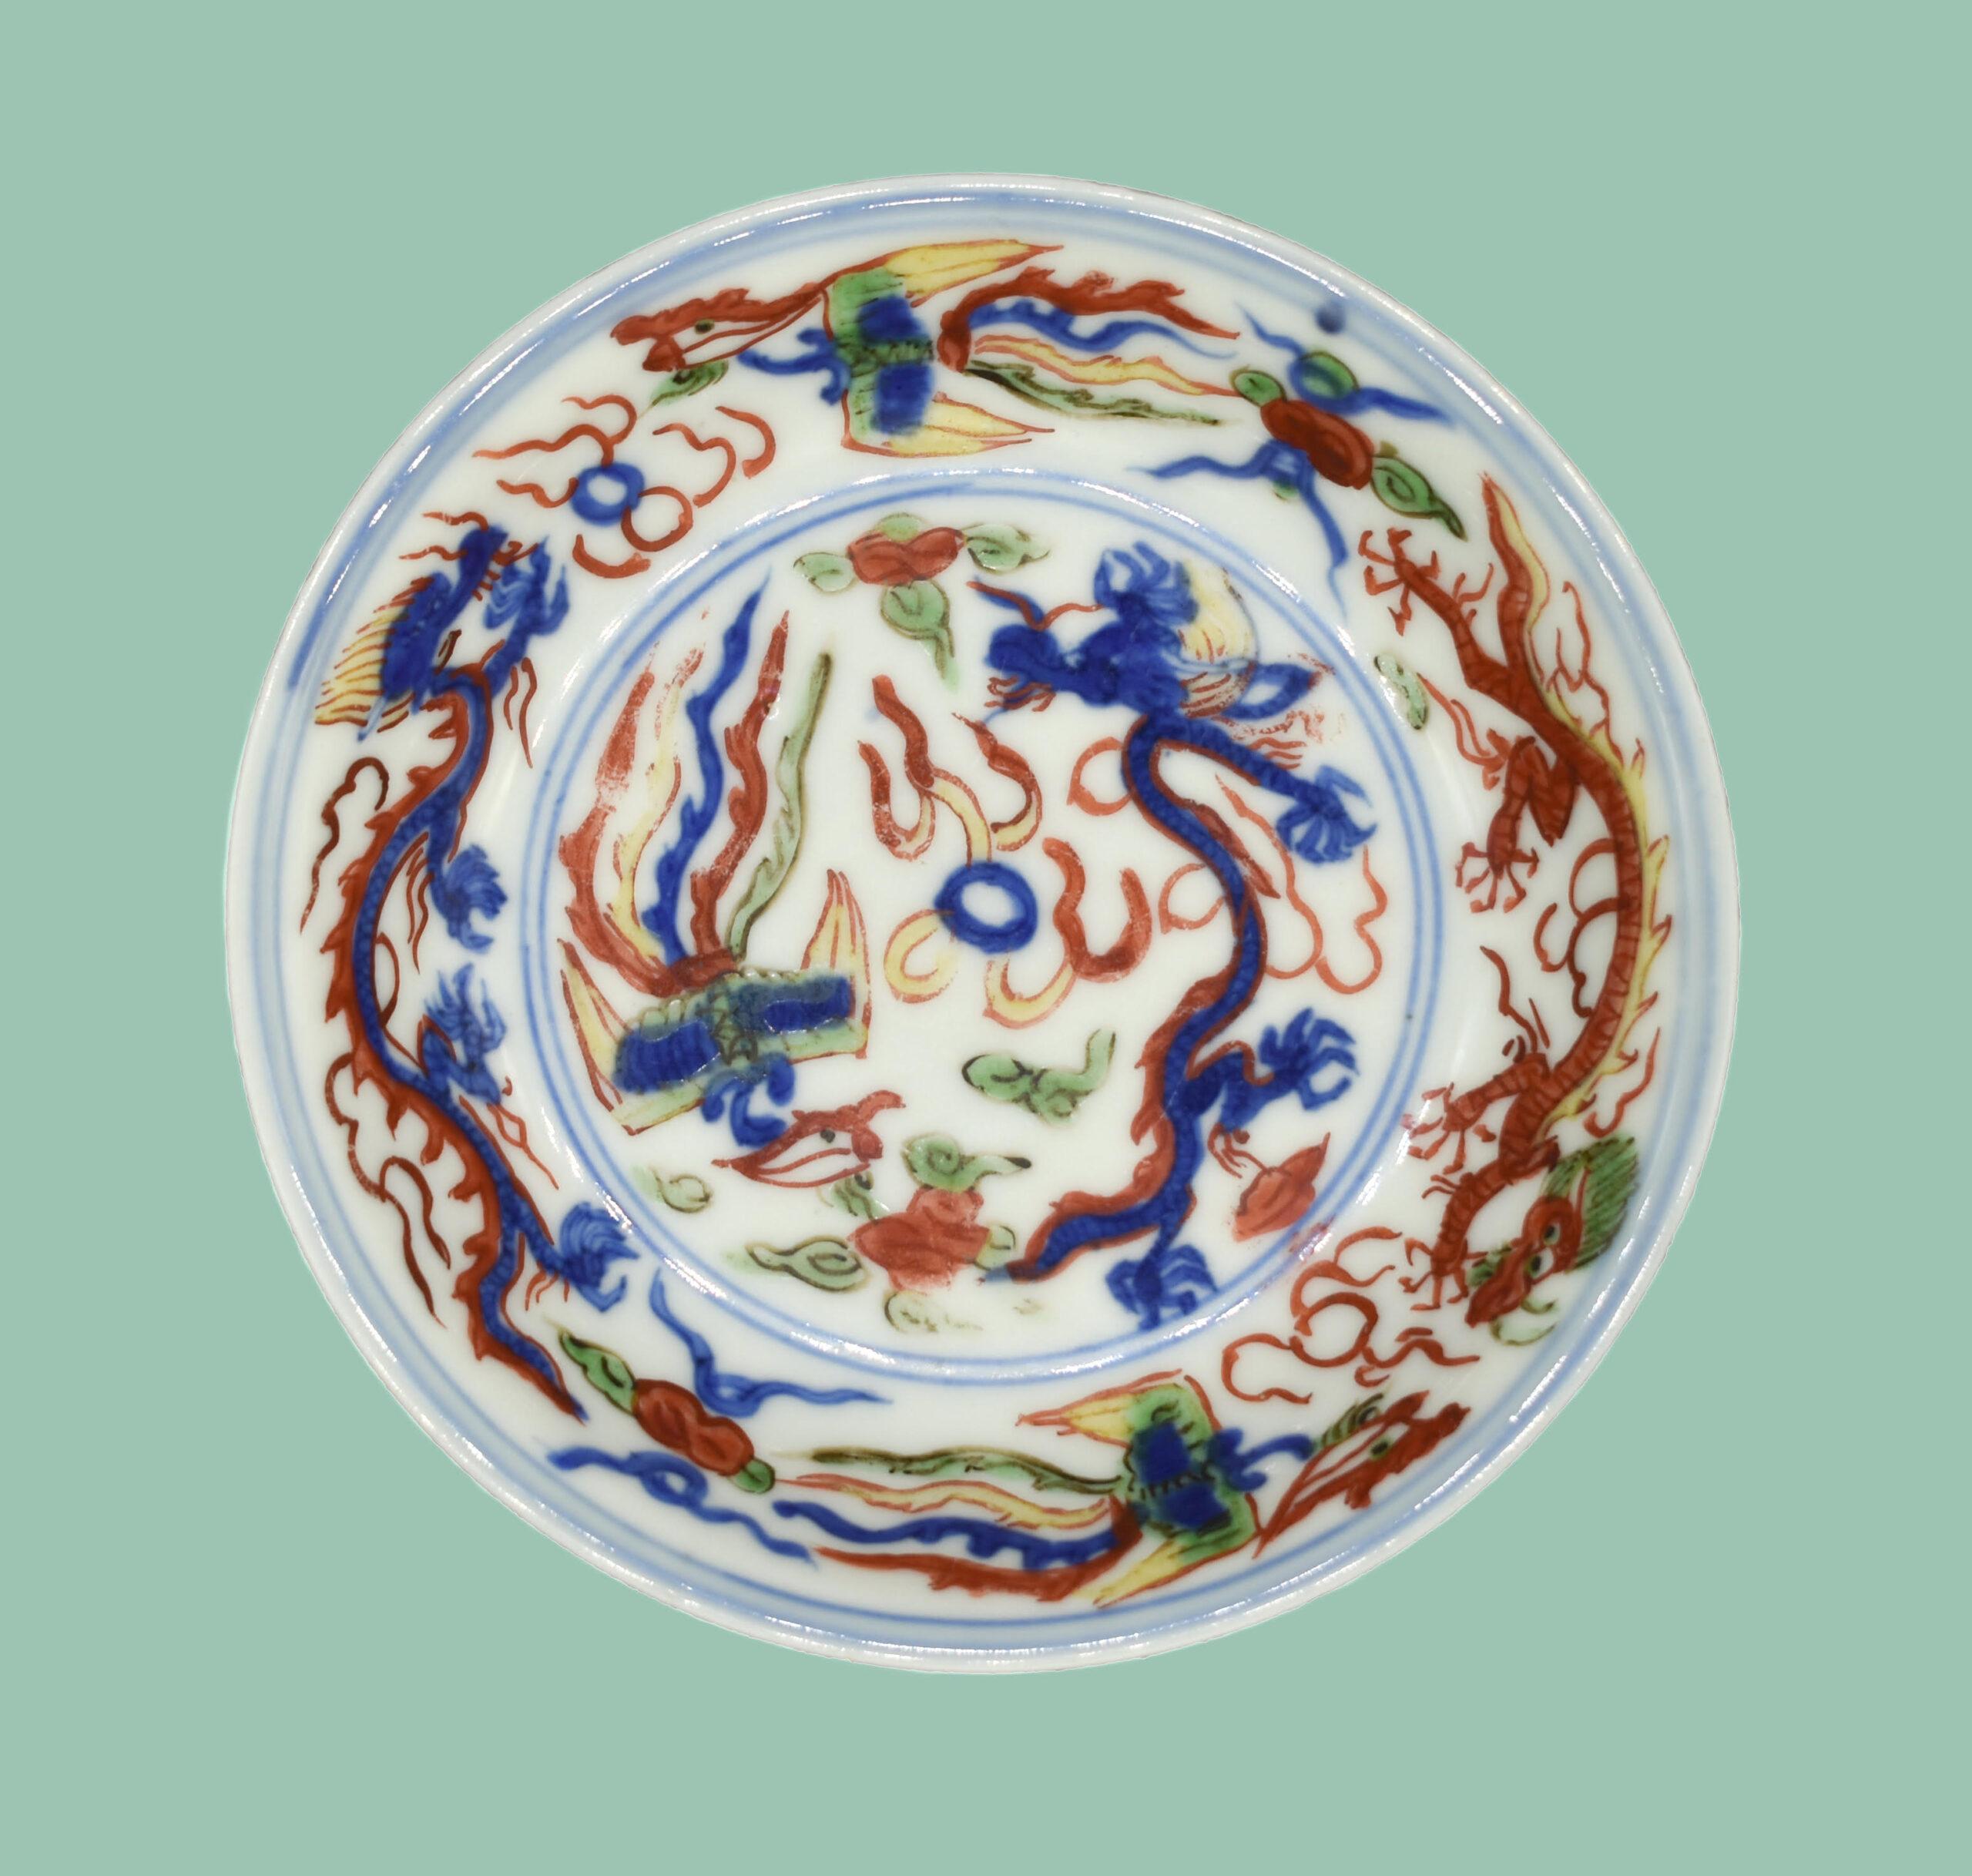 A Fine Wanli Mark and Period Wucai Dragon and Phoenix Dish, Wanli Period (1573-1620), Ming Dynasty D:11.2cm